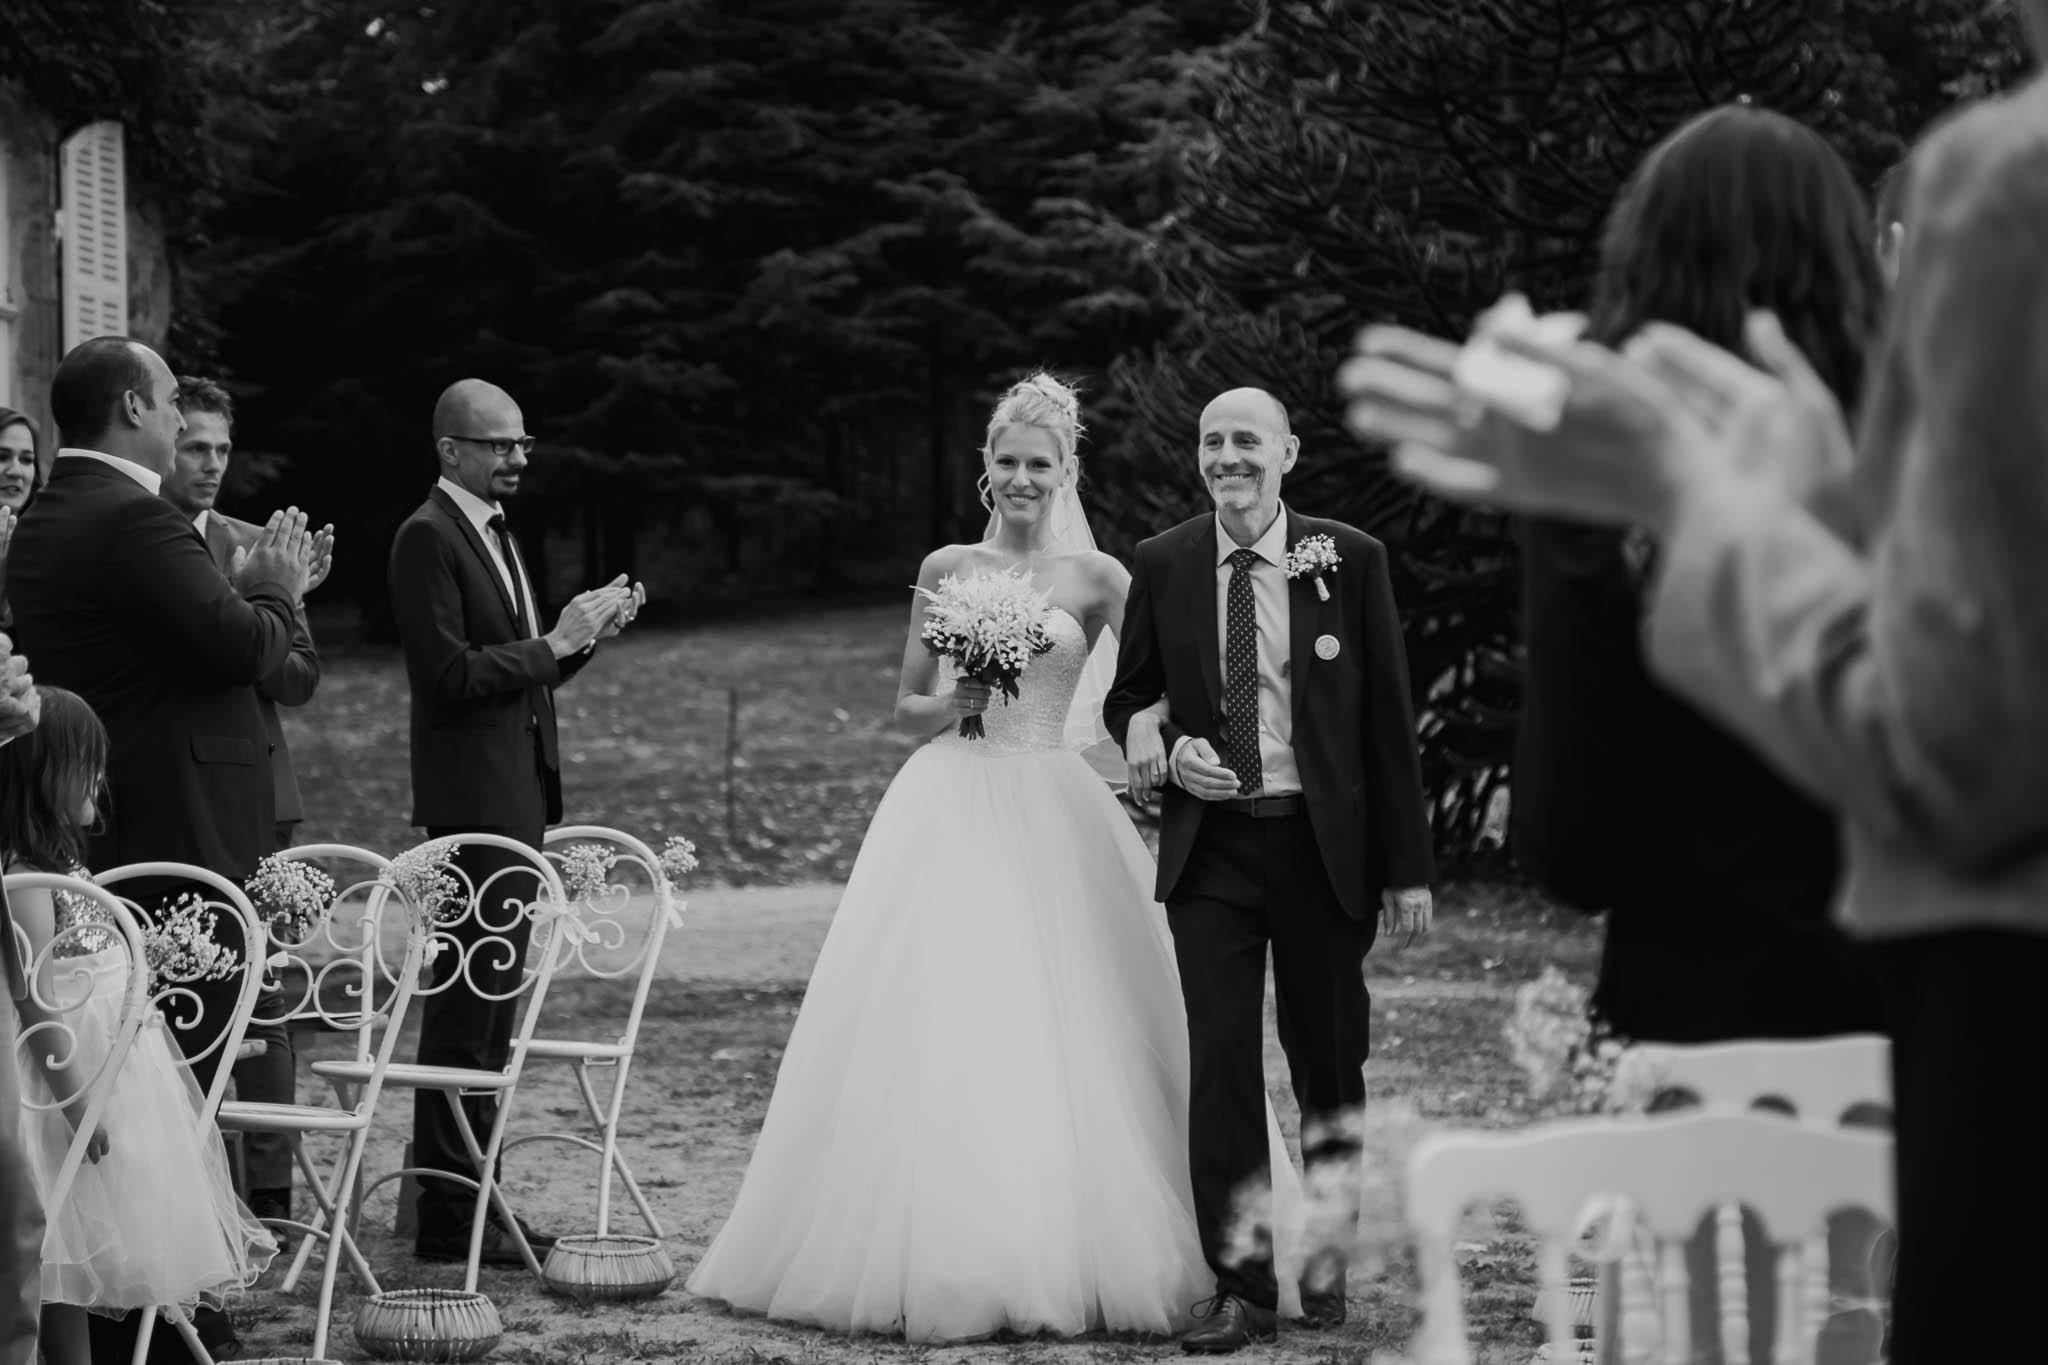 mariage-chateau-gaudras-ingold-30.jpg